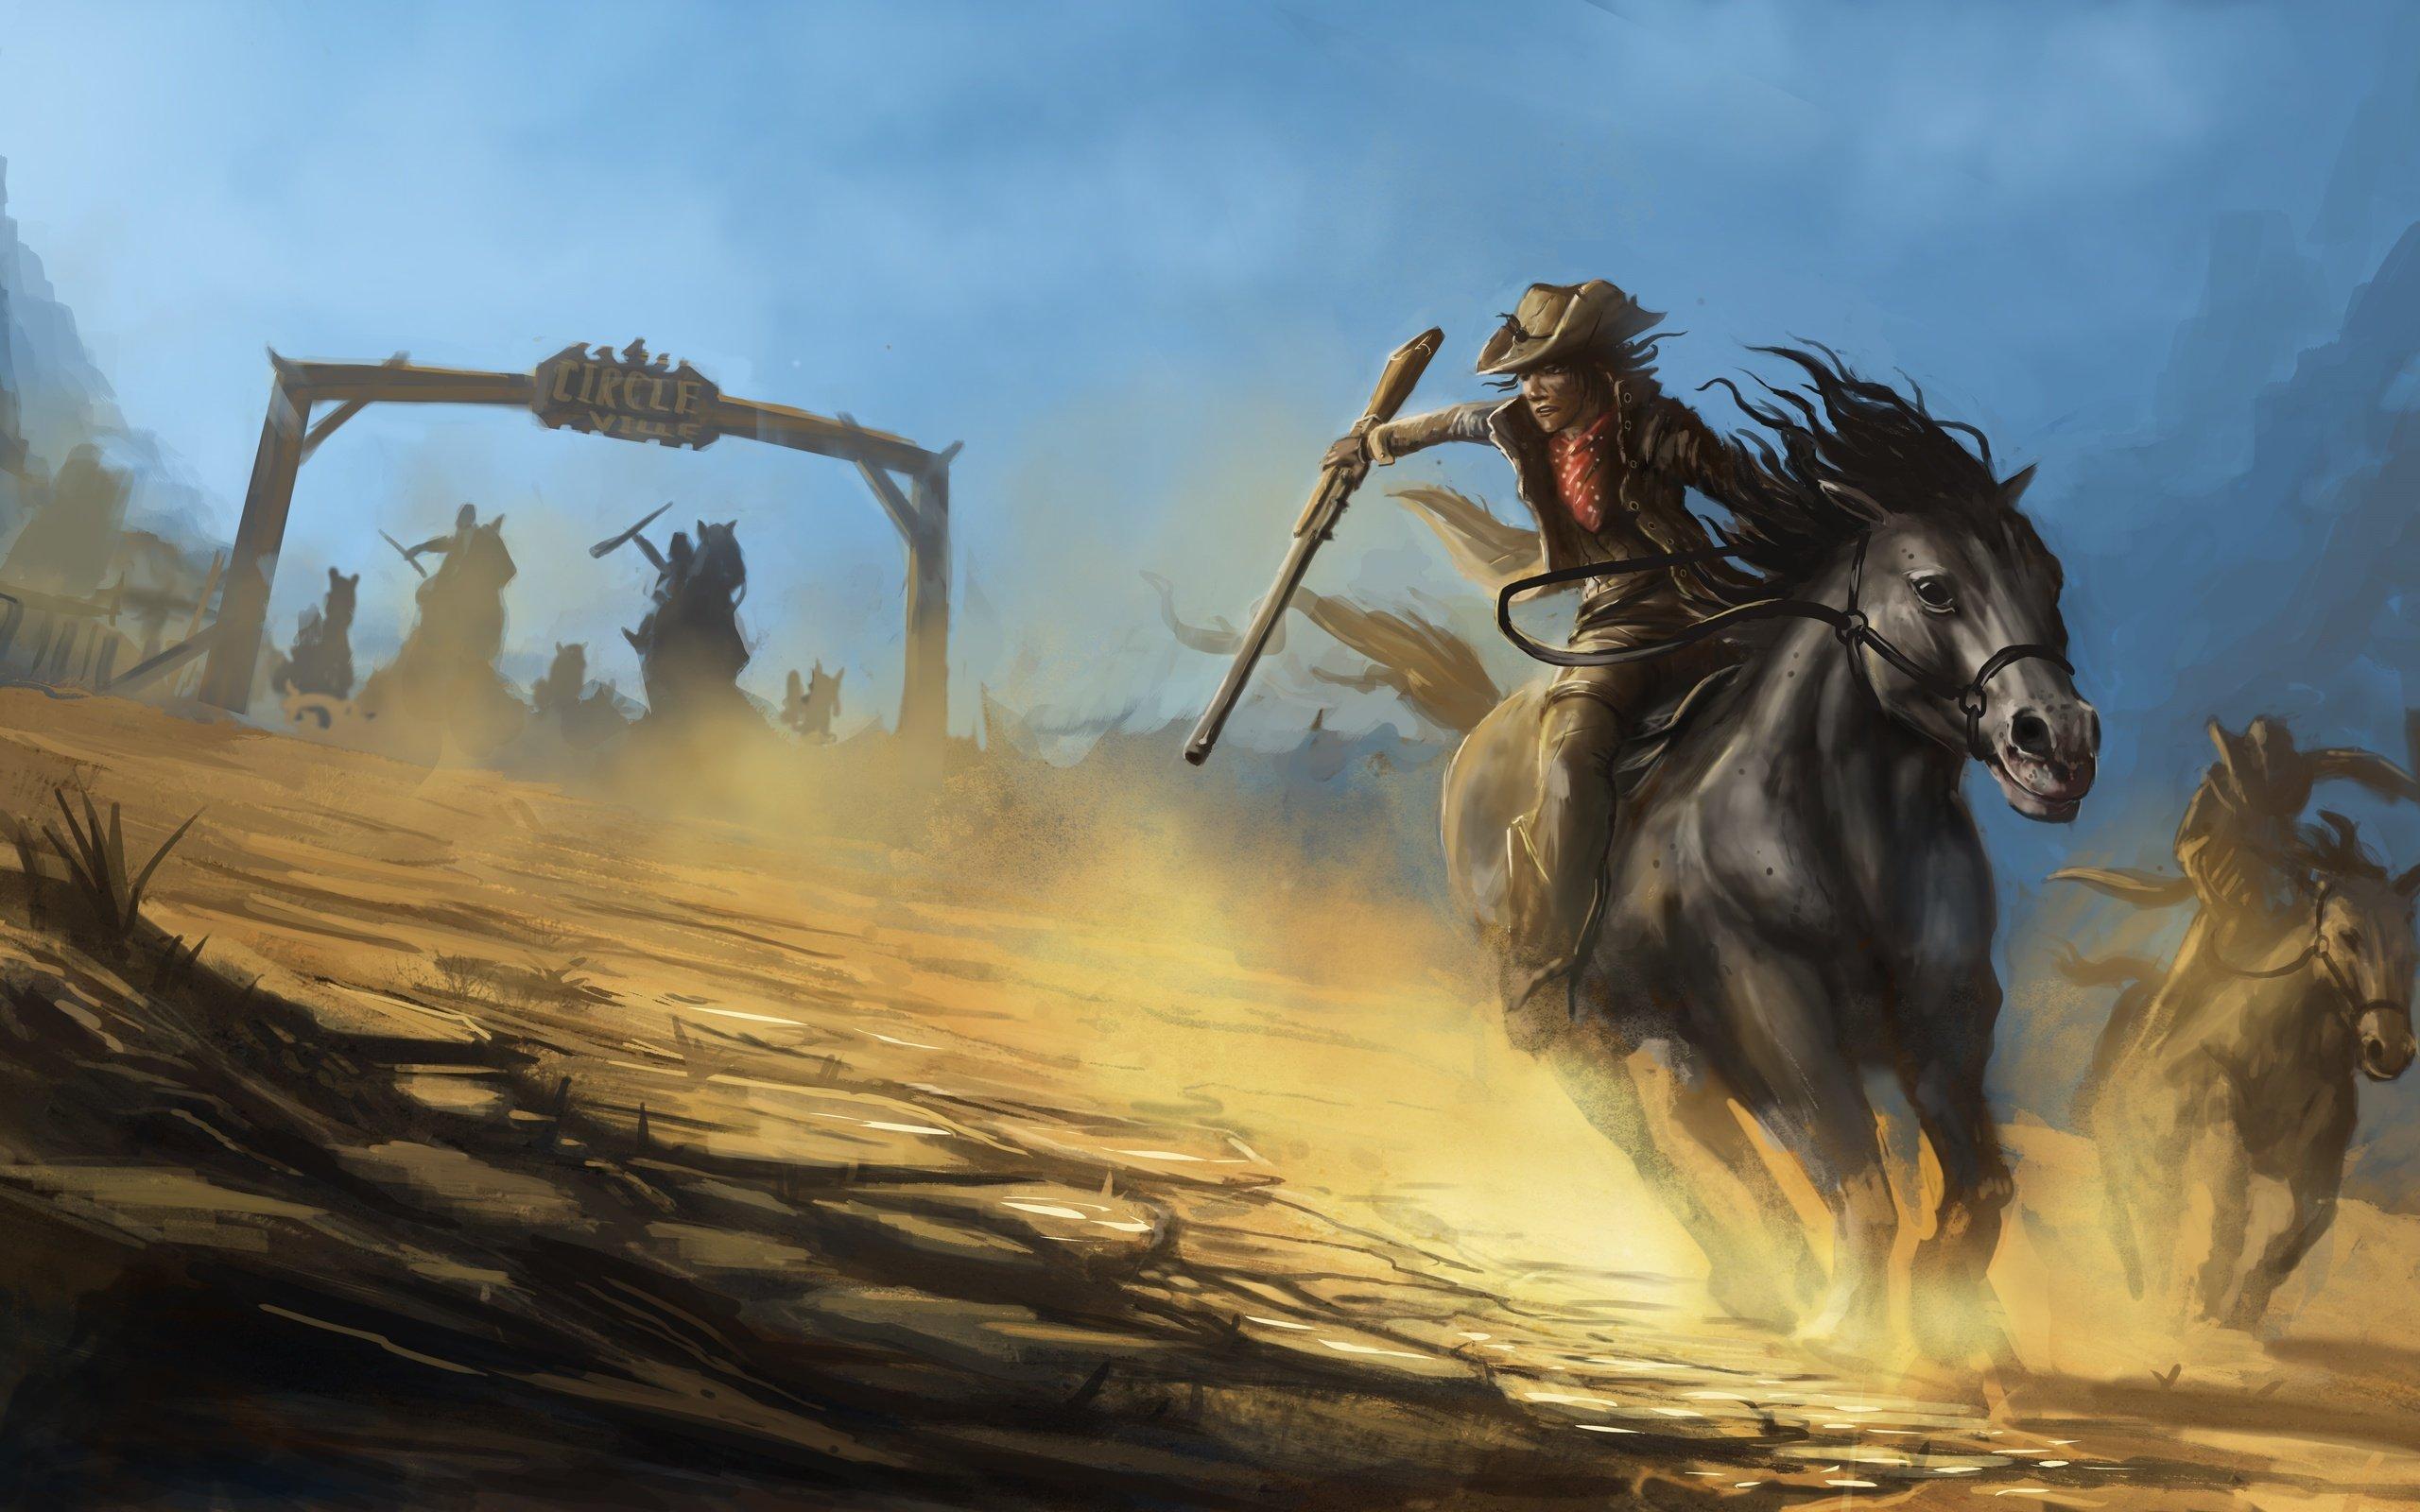 46 cowboy and western desktop wallpaper on wallpapersafari - Cowboy wallpaper hd ...